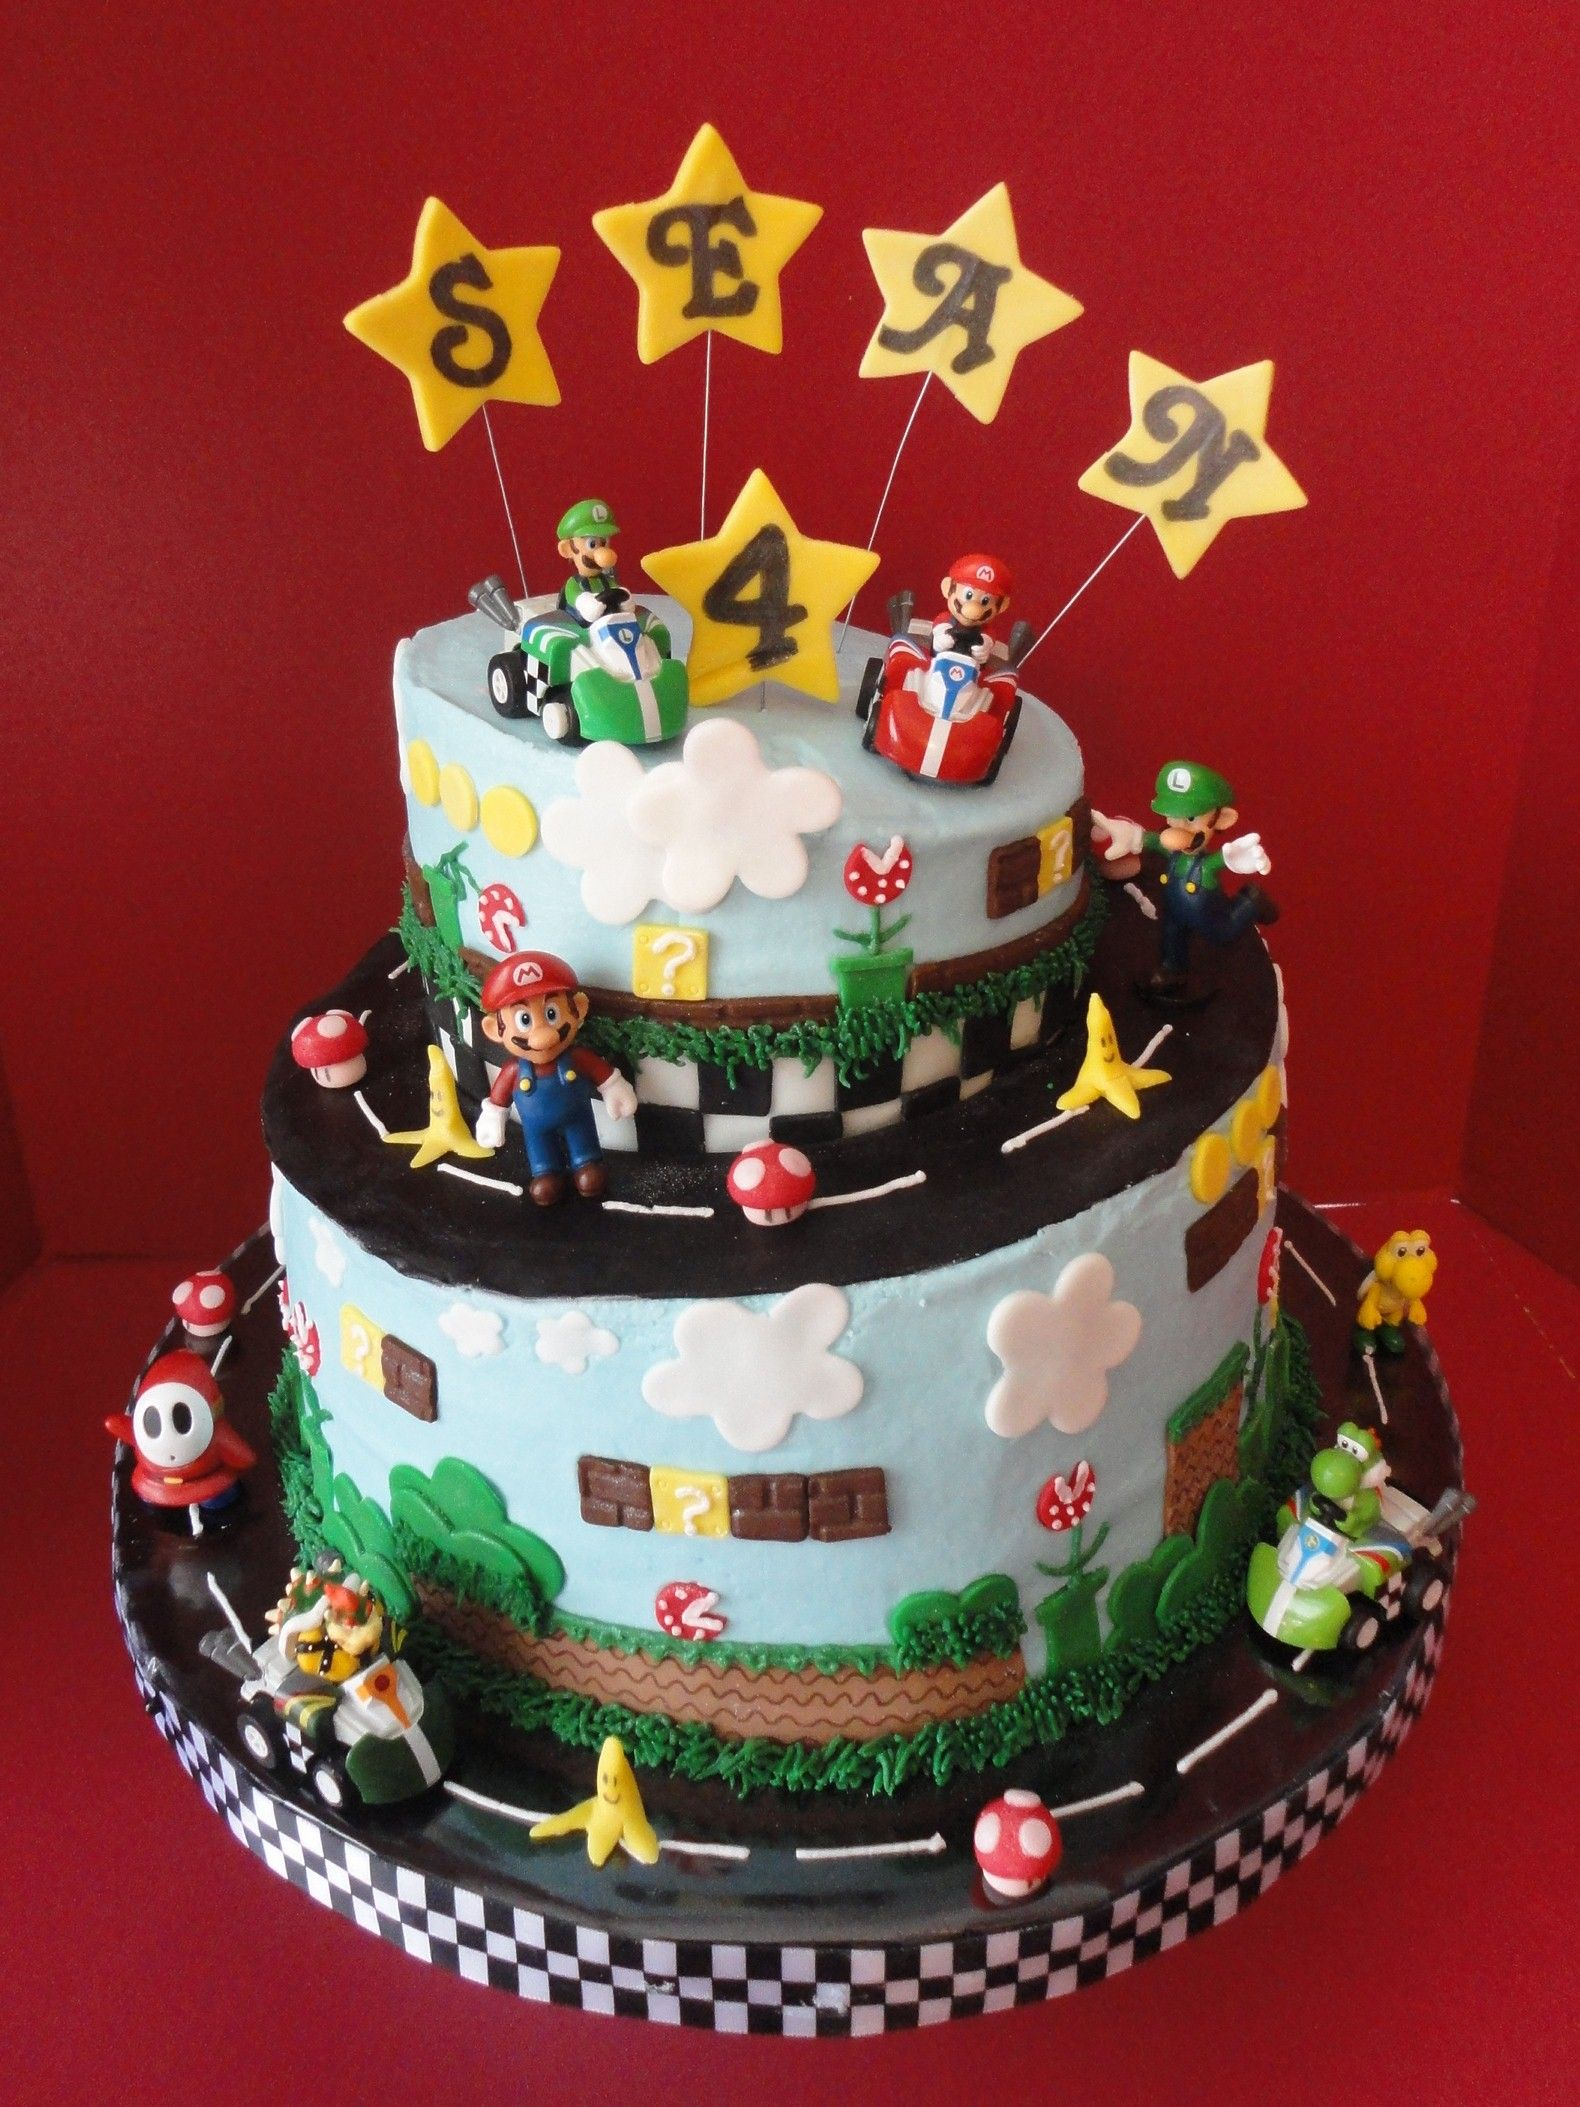 Mario Kart Birthday Cake Birthday party ideas Pinterest Mario